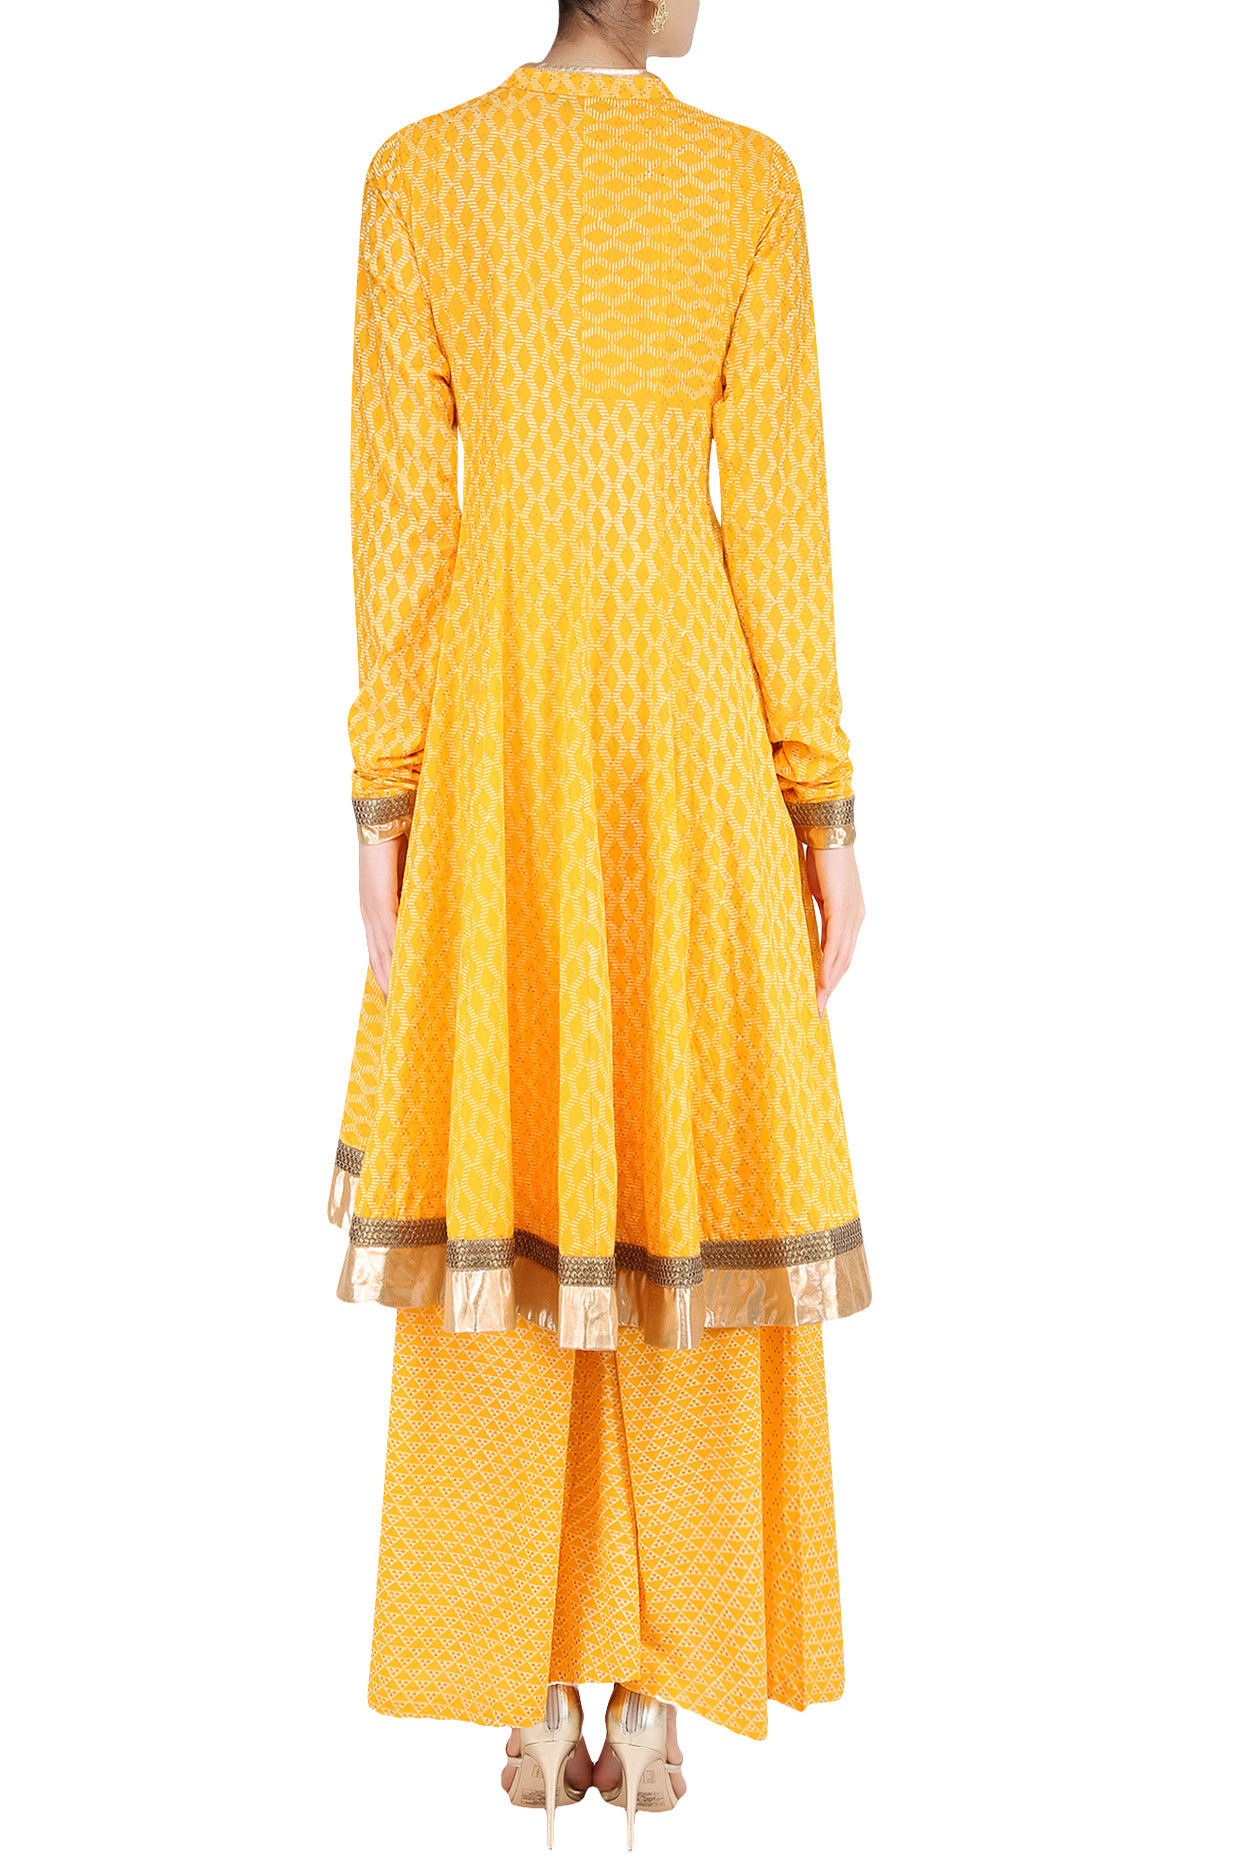 Yellow Angrakha Style Anarkali Kurta and Sharara Pants Set by Surendri